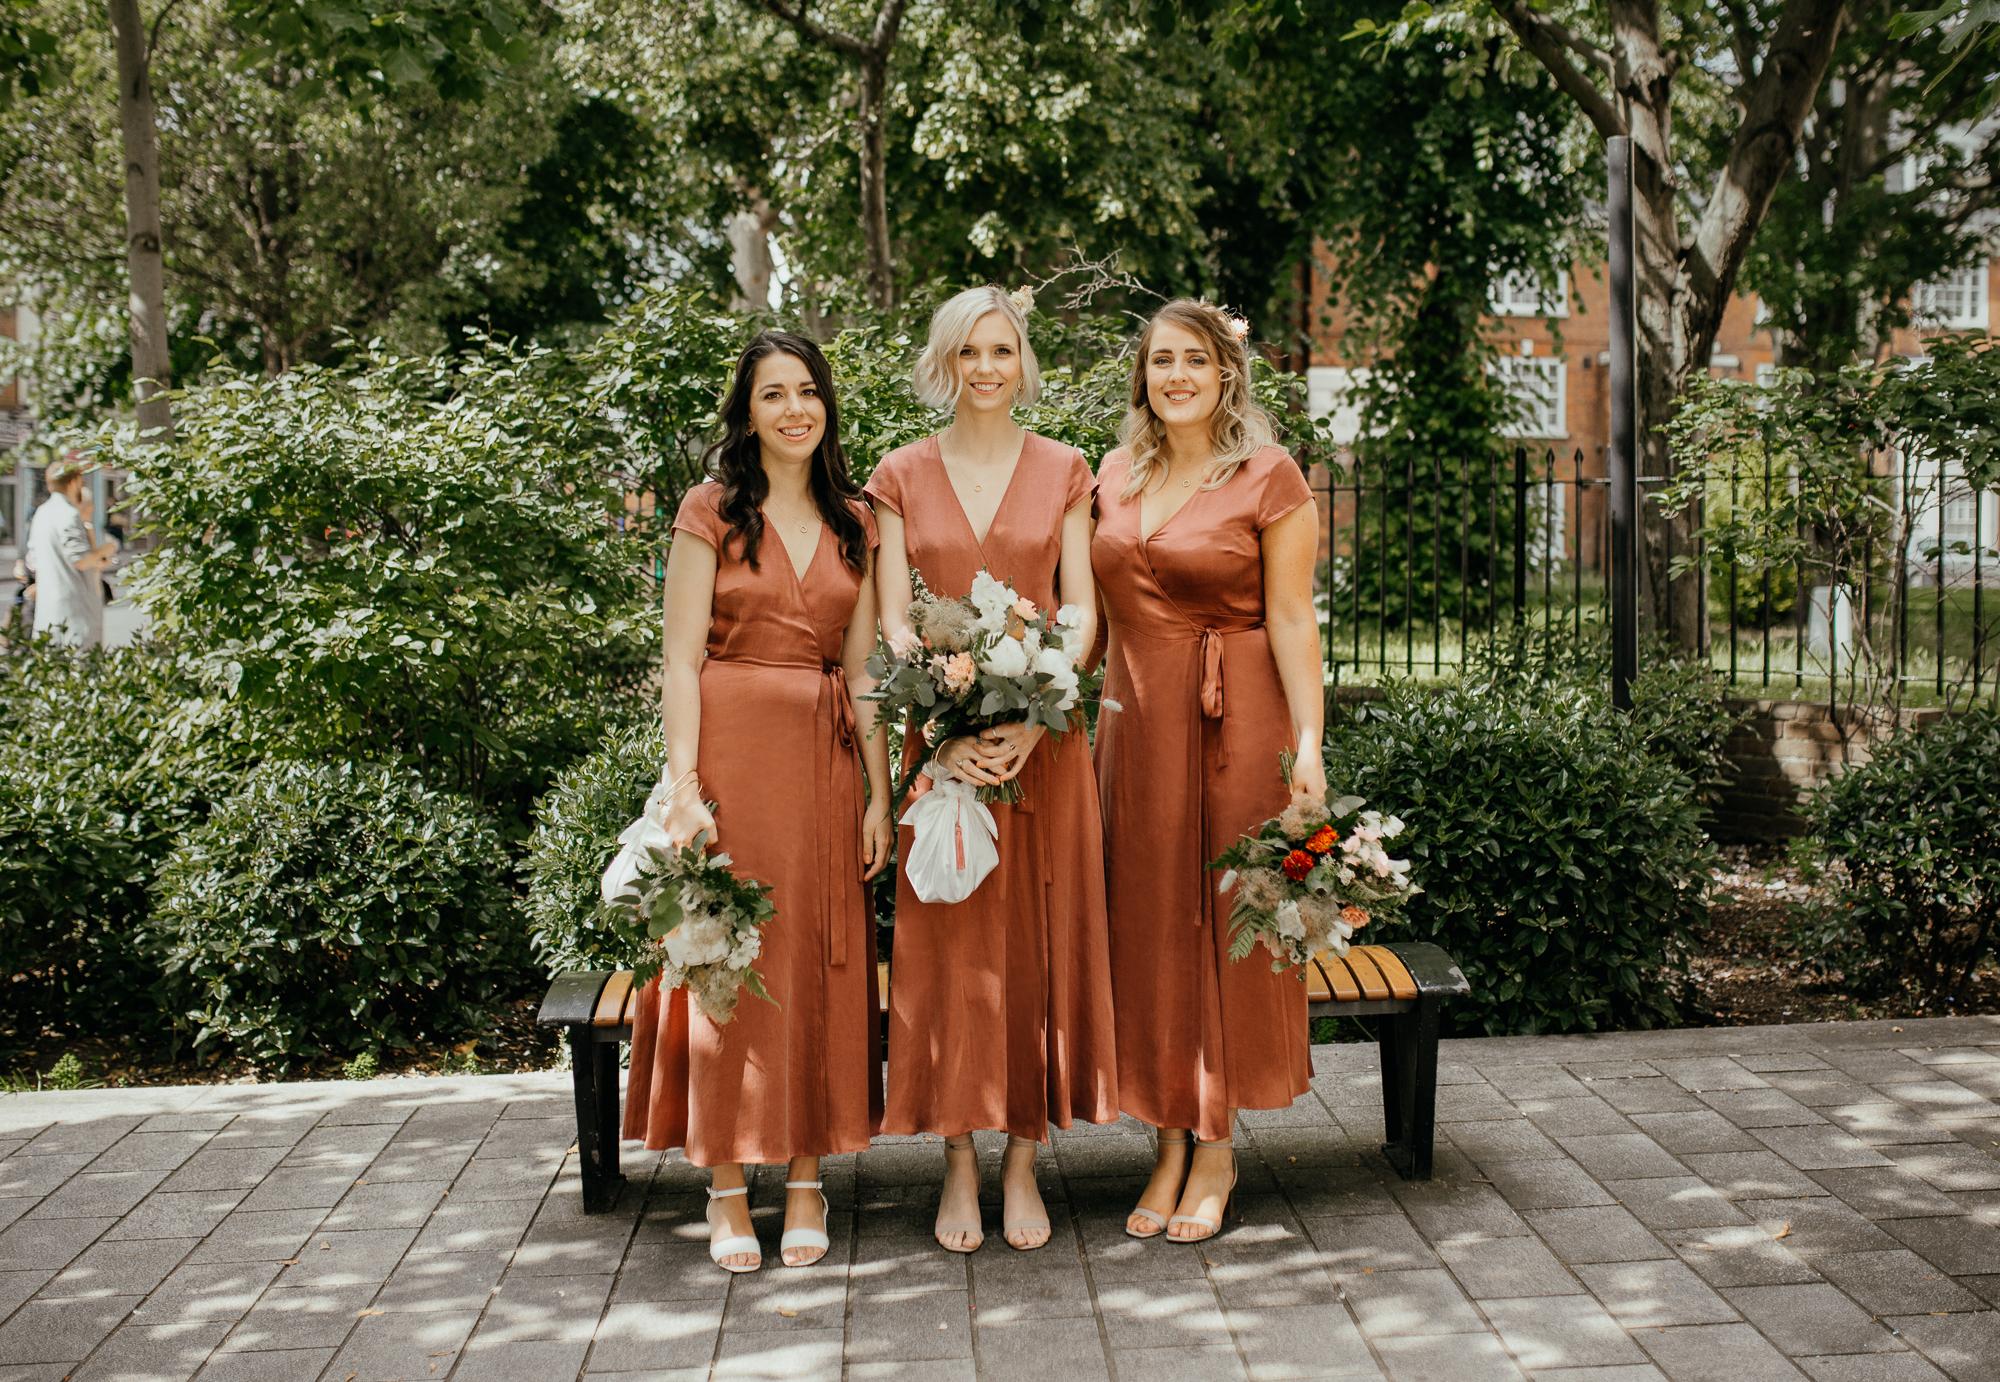 Nicebunch wedding flowers sula london-islington-town-hall-depot-n7 ethical british luxury bridesmaids burnt orange ferns stephanie-green-wedding-photography